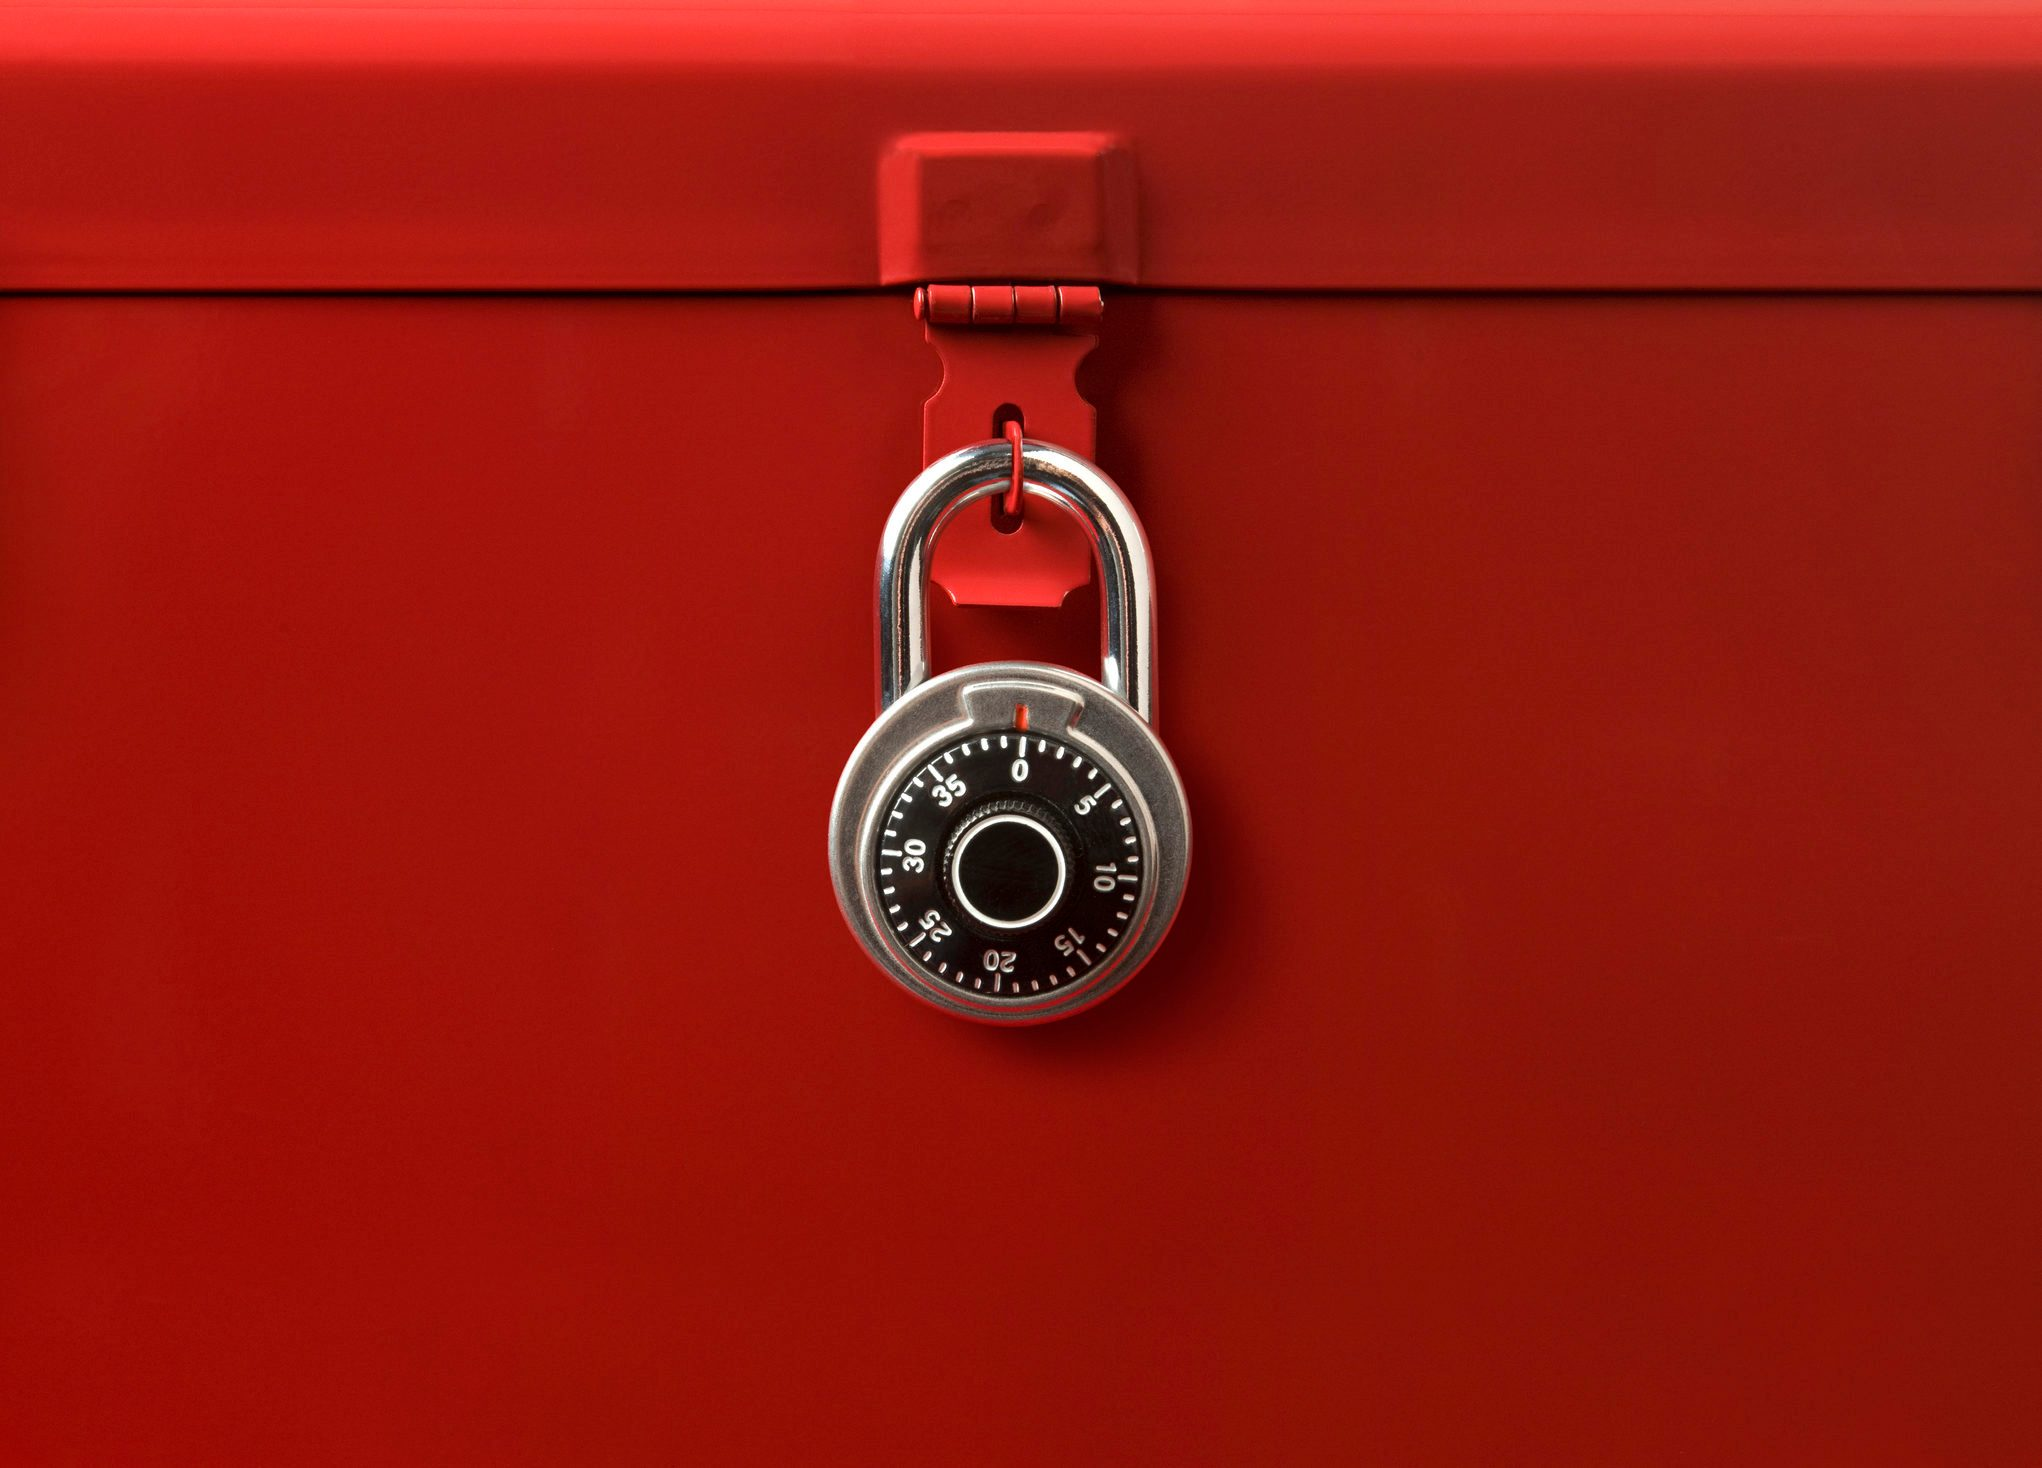 Toolbox and Lock